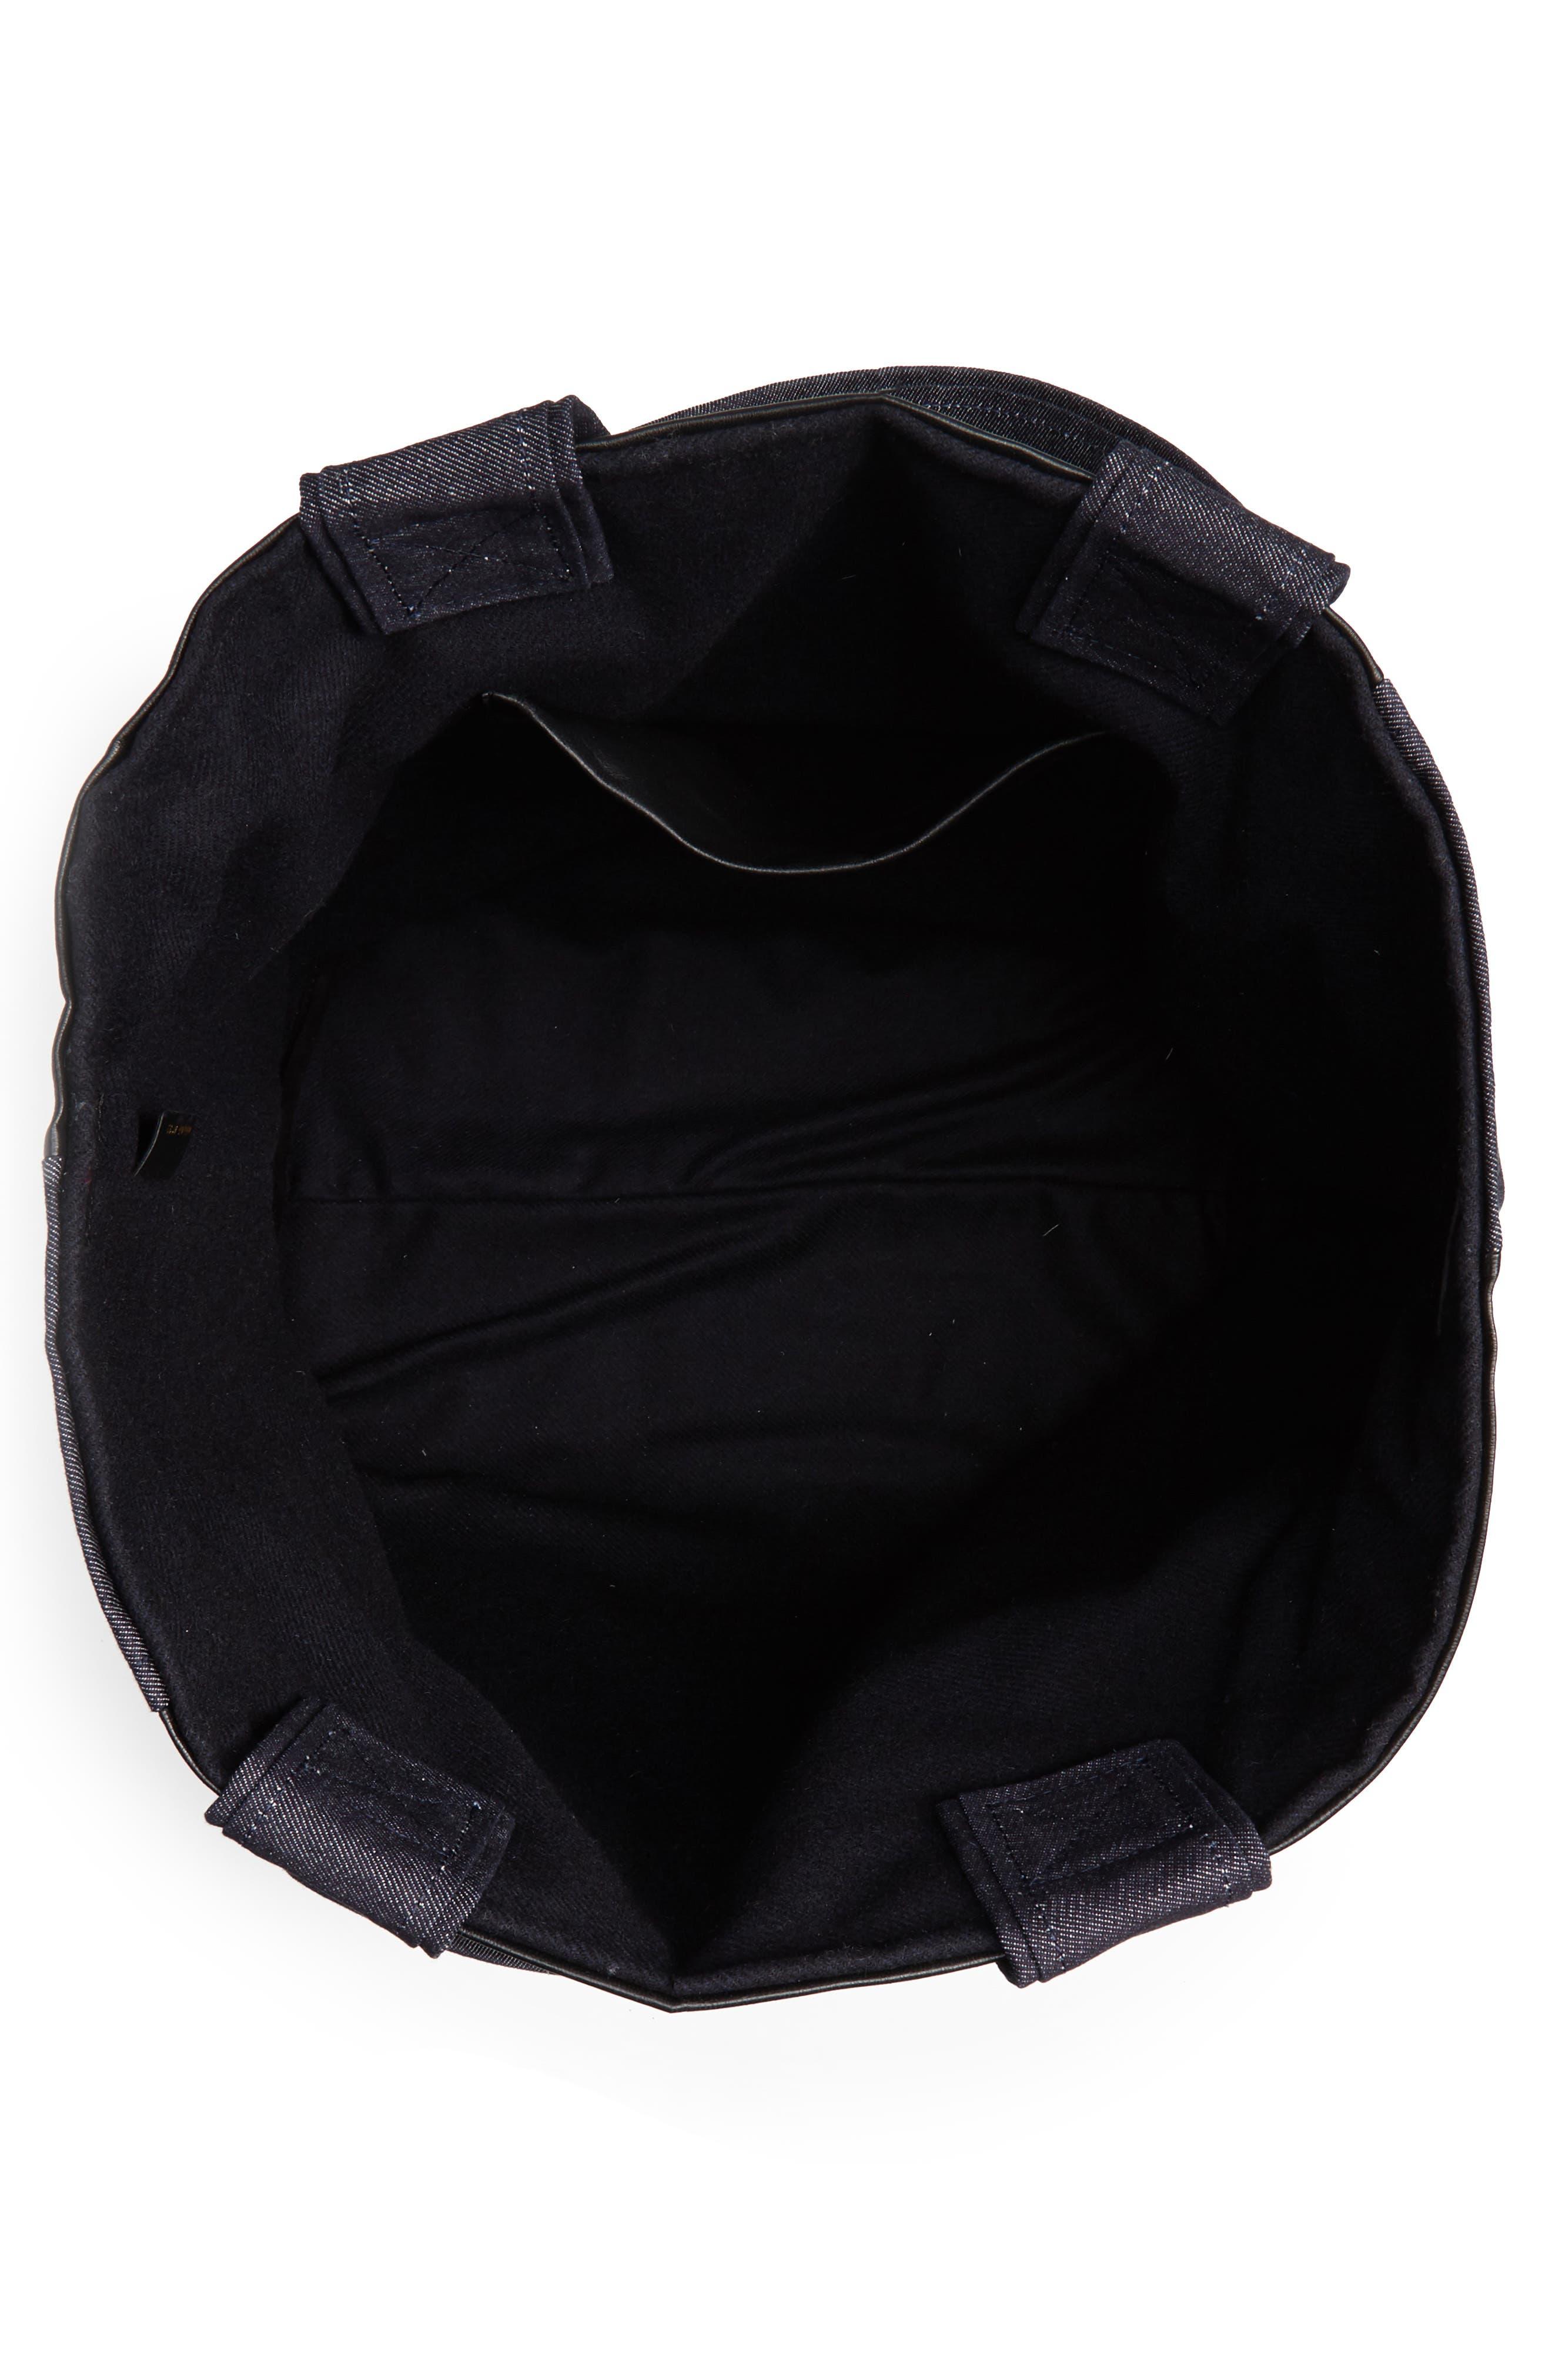 VICTORIA BECKHAM, Sunday Denim & Leather Tote Bag, Alternate thumbnail 4, color, 400